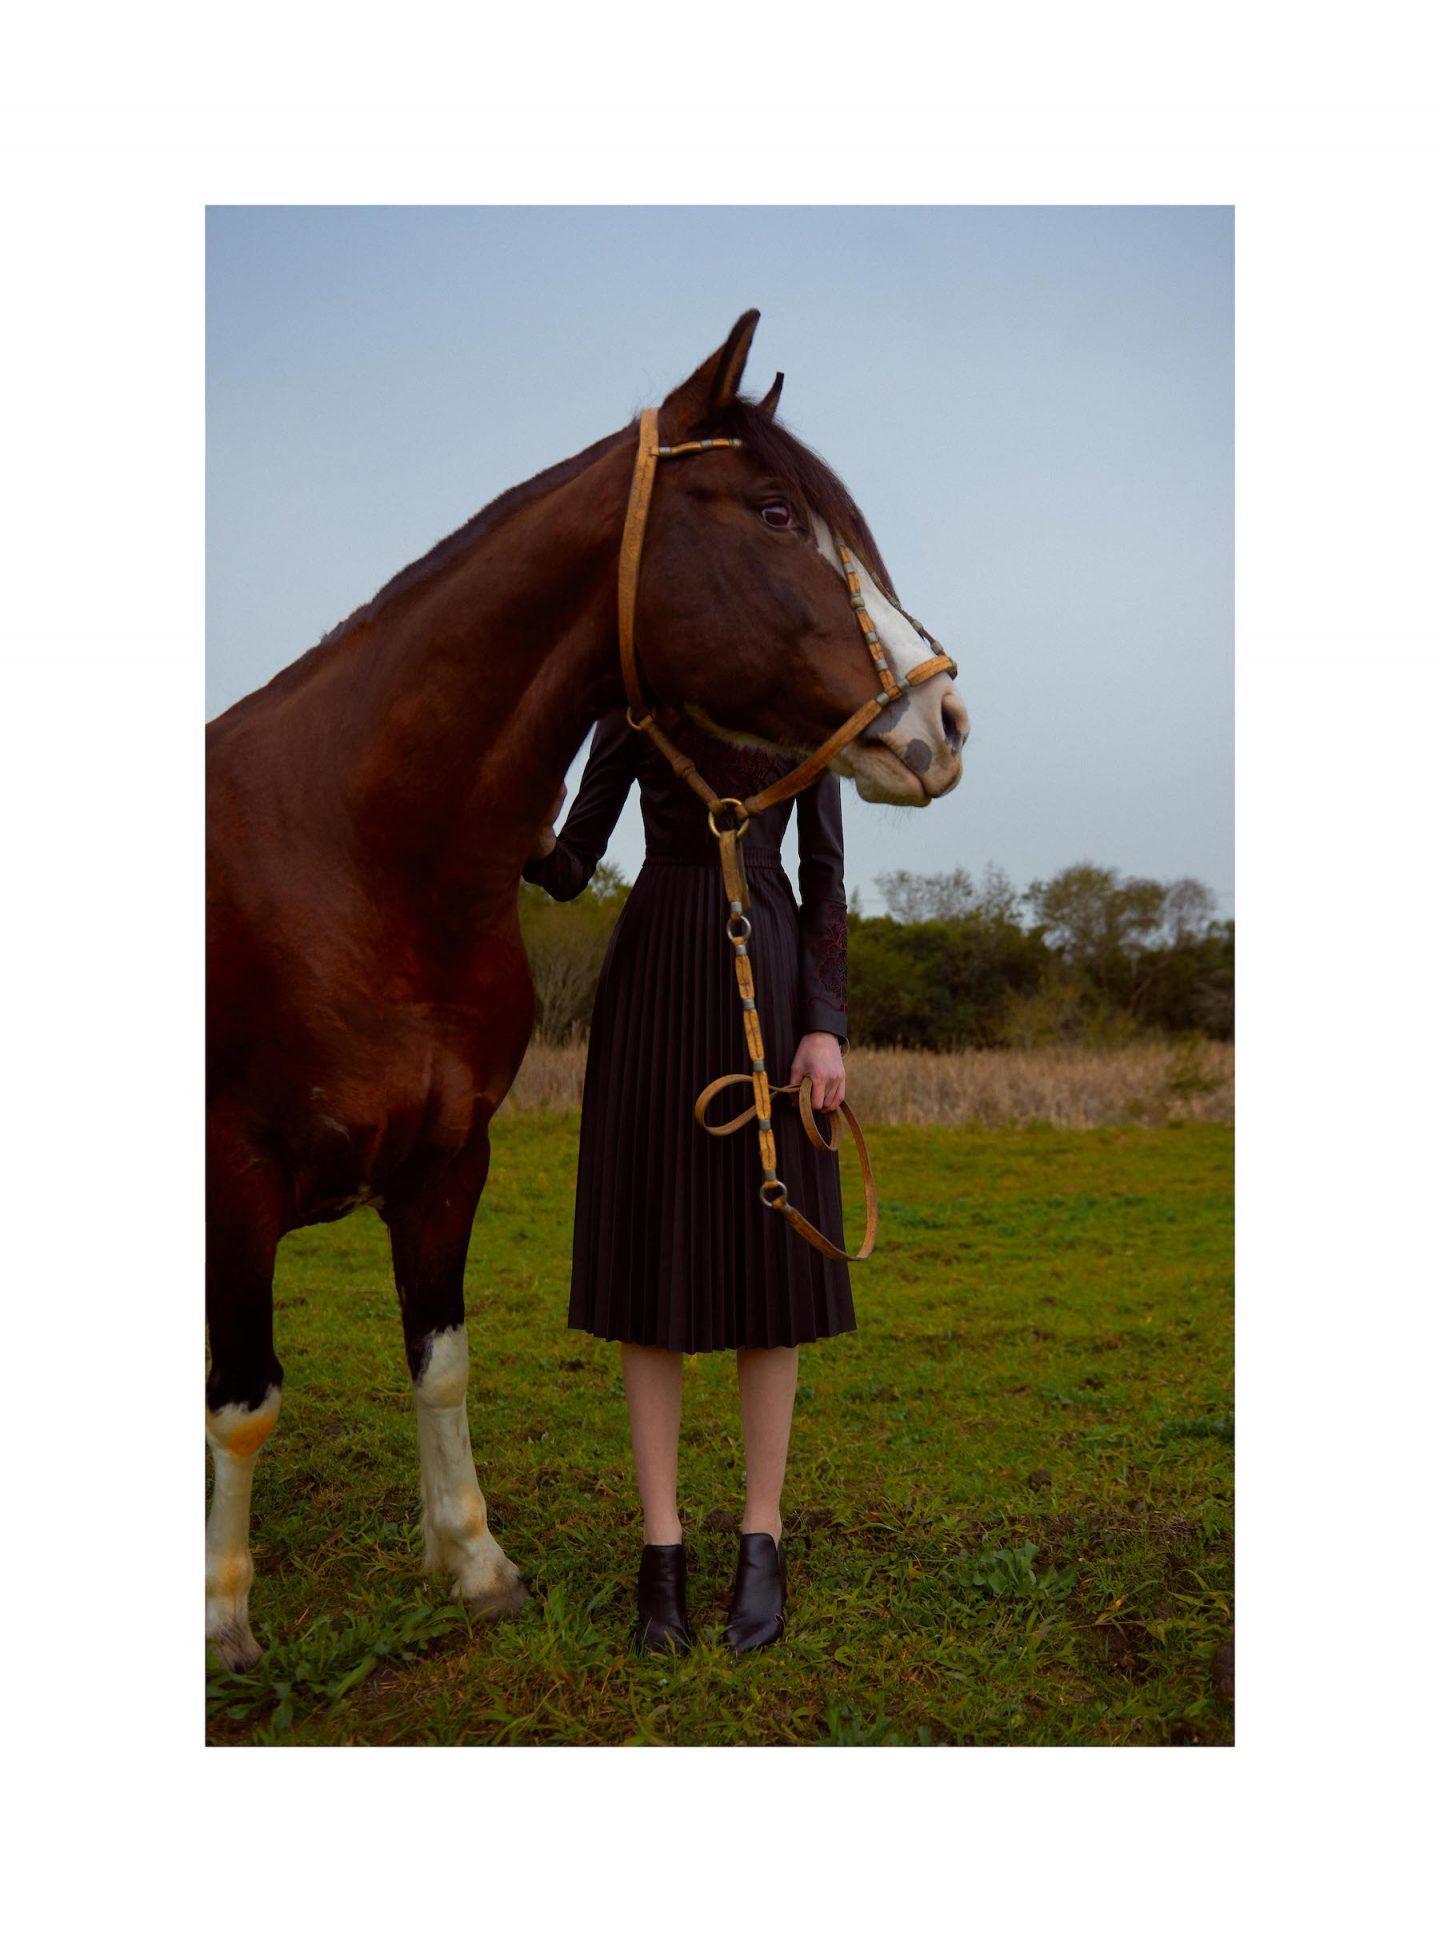 IGNANT-Photography-Michael-Willian-01